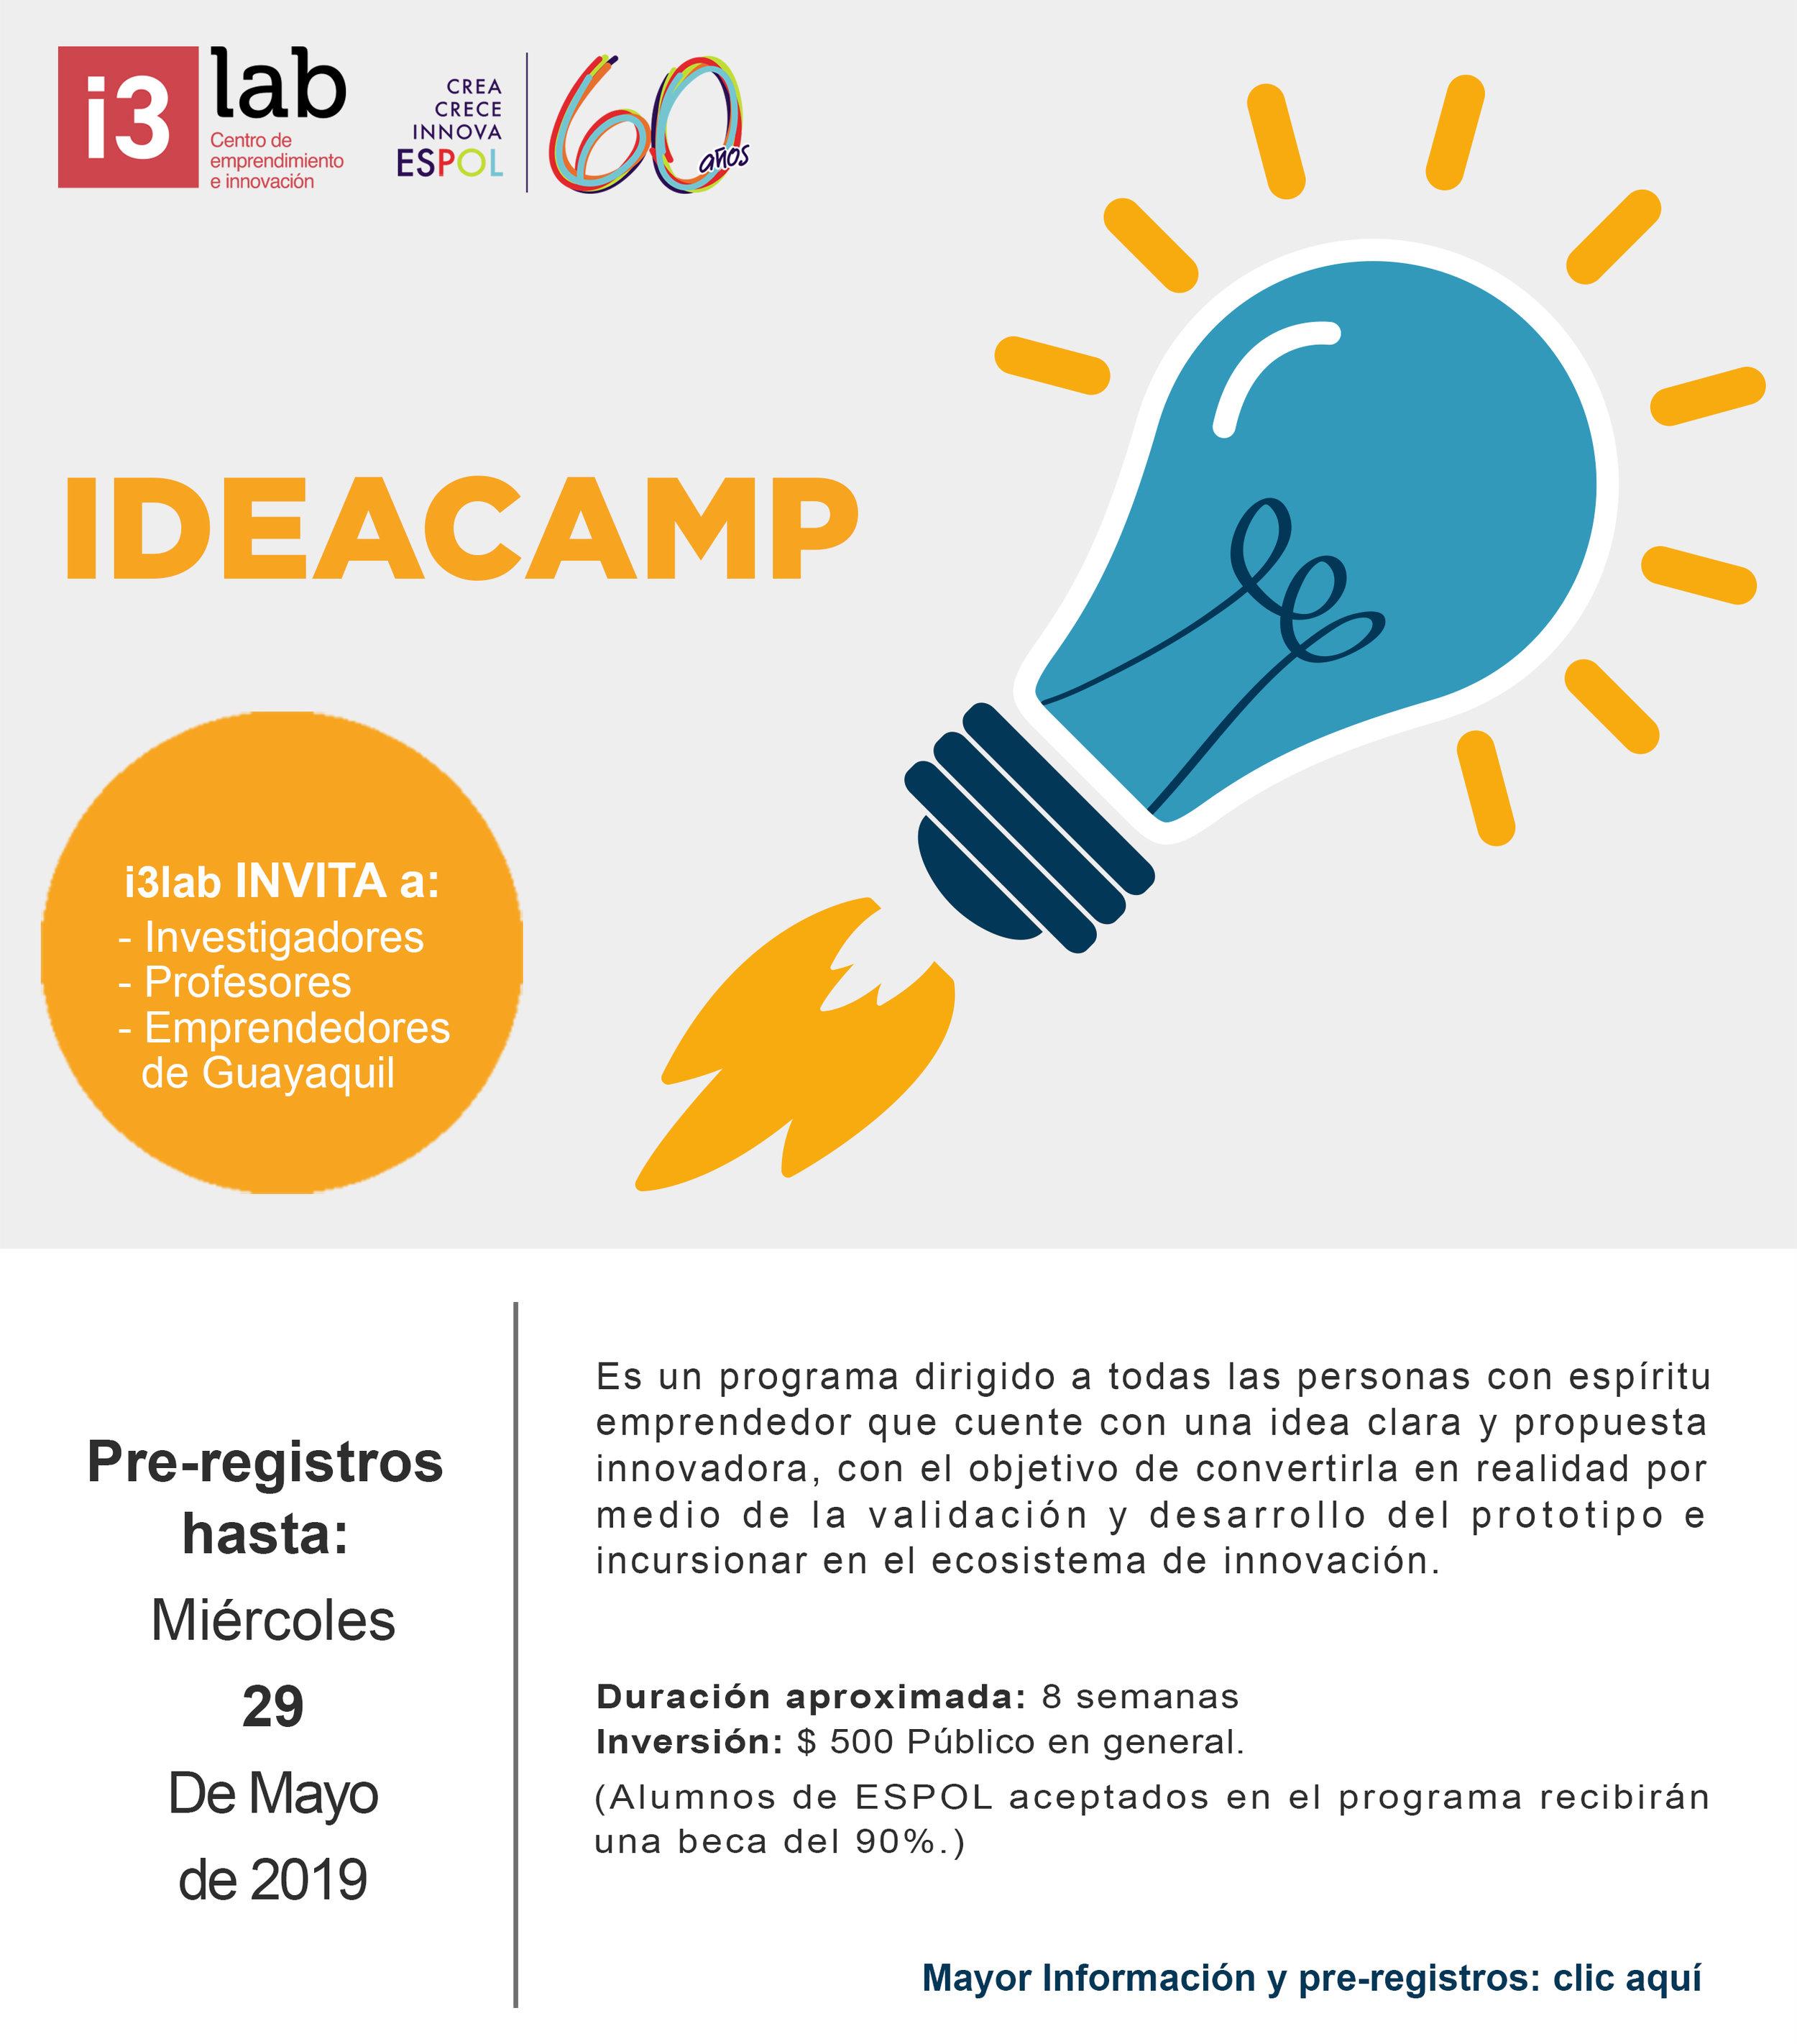 Ideacamp3 (1)(3).jpg